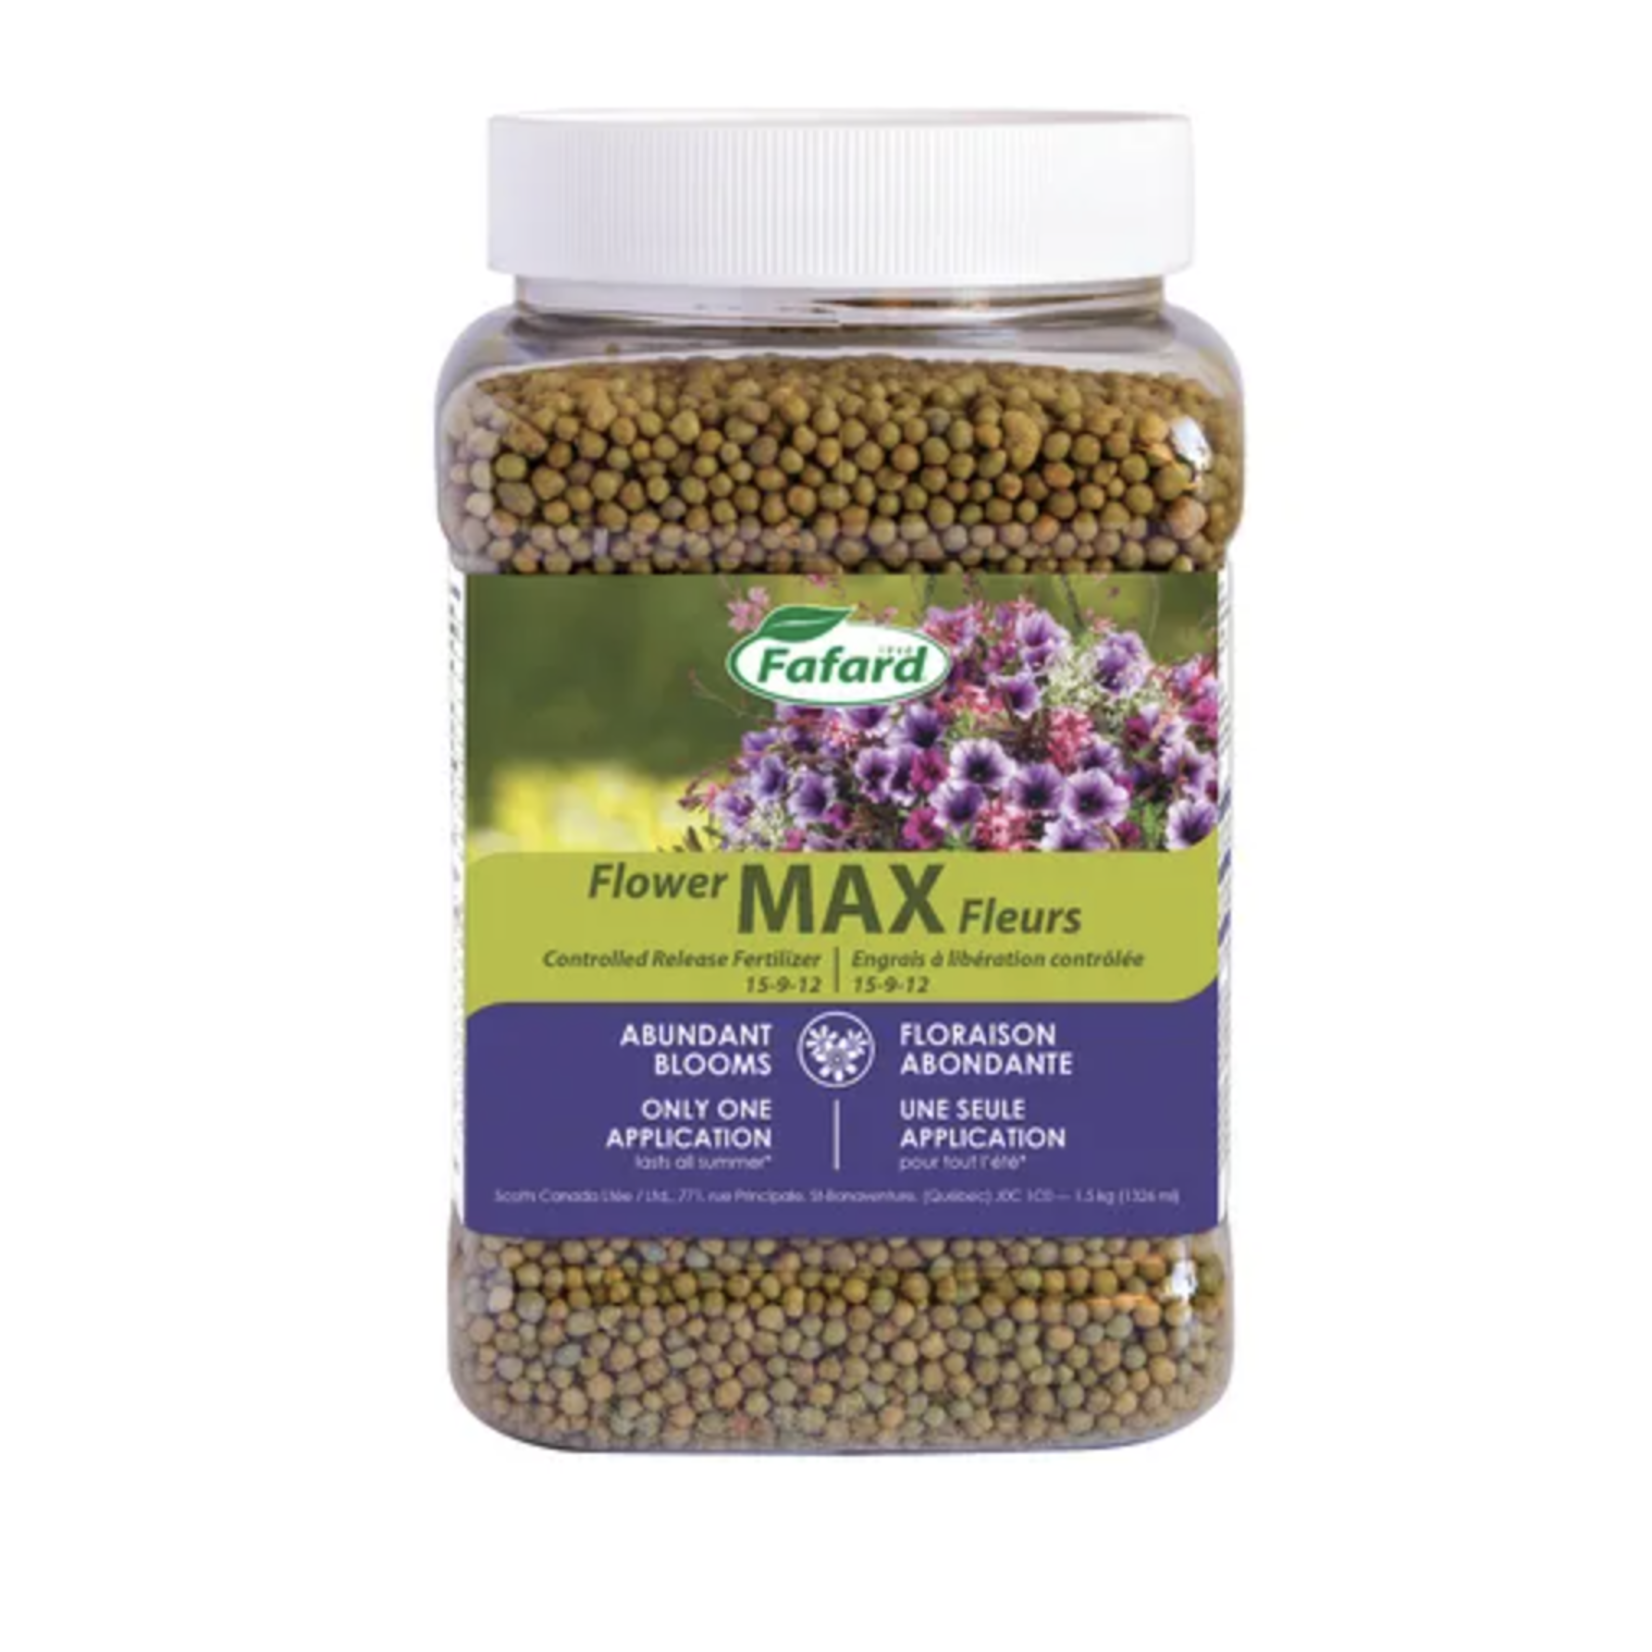 Fafard Flower Max Controlled Release Fertilizer (15-9-12) 1.5 KG